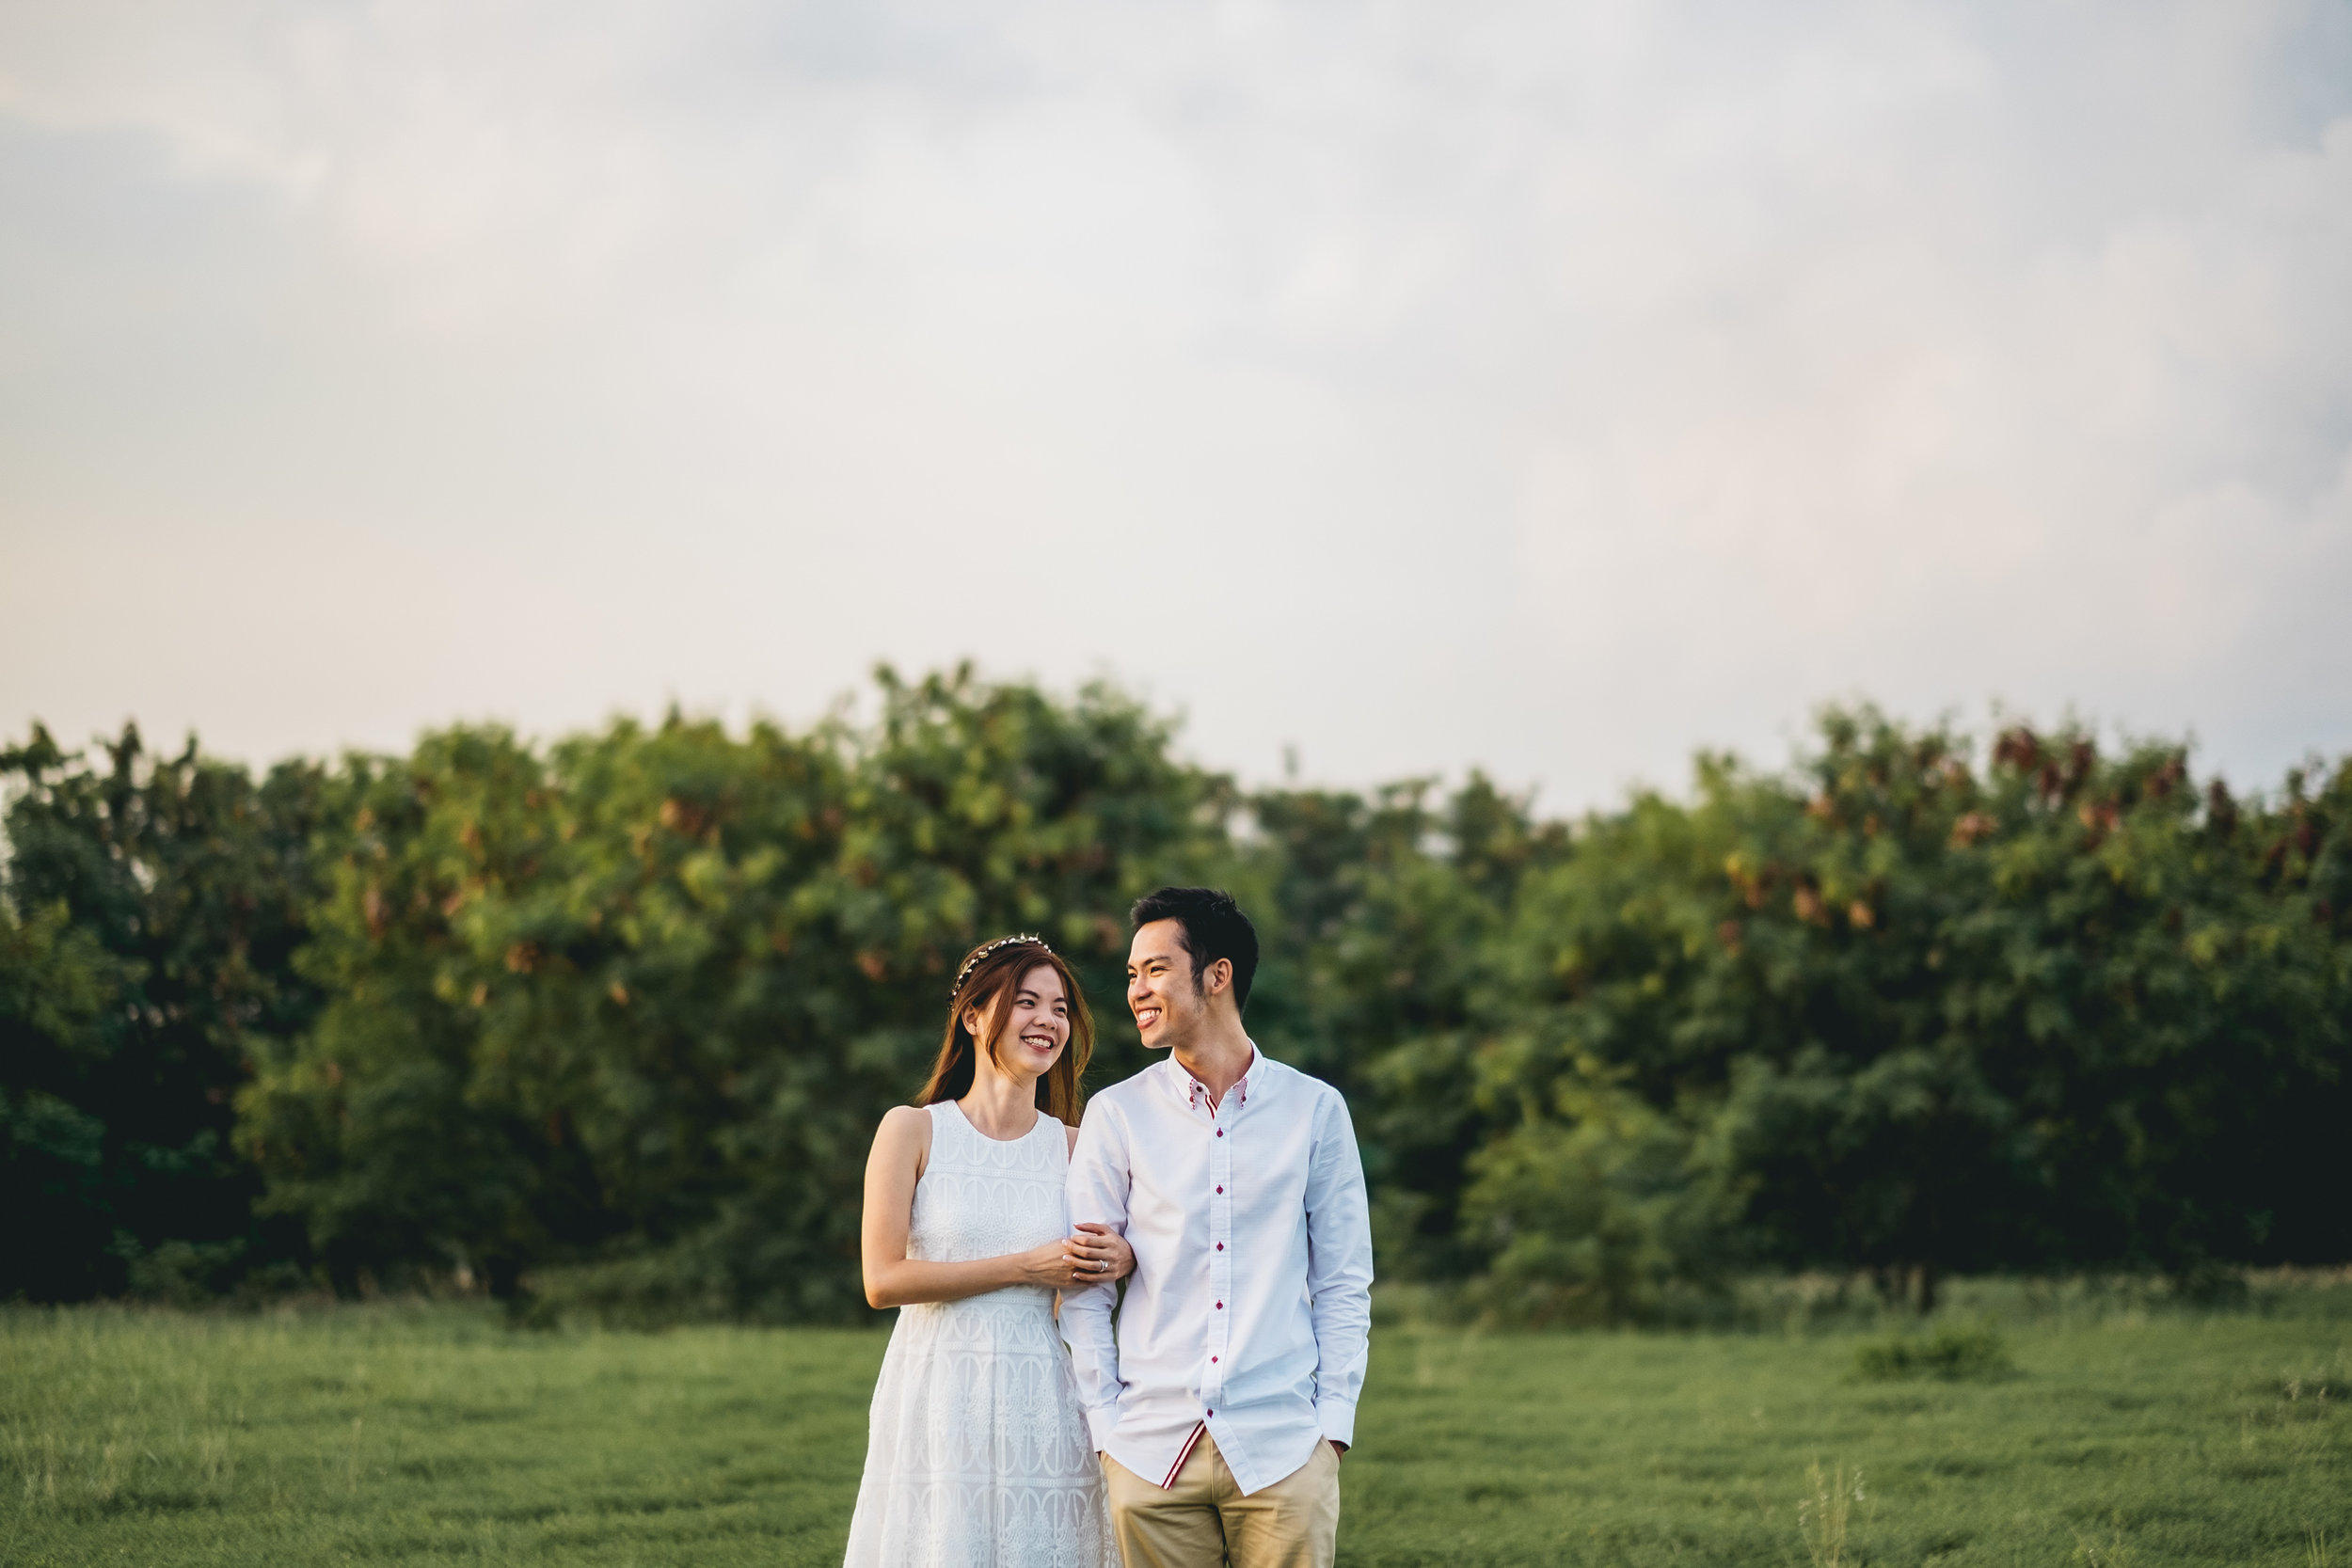 Juxtapose Pix - Pre-Wedding - Mark & Therese - Tuas Sunset 00004.jpg